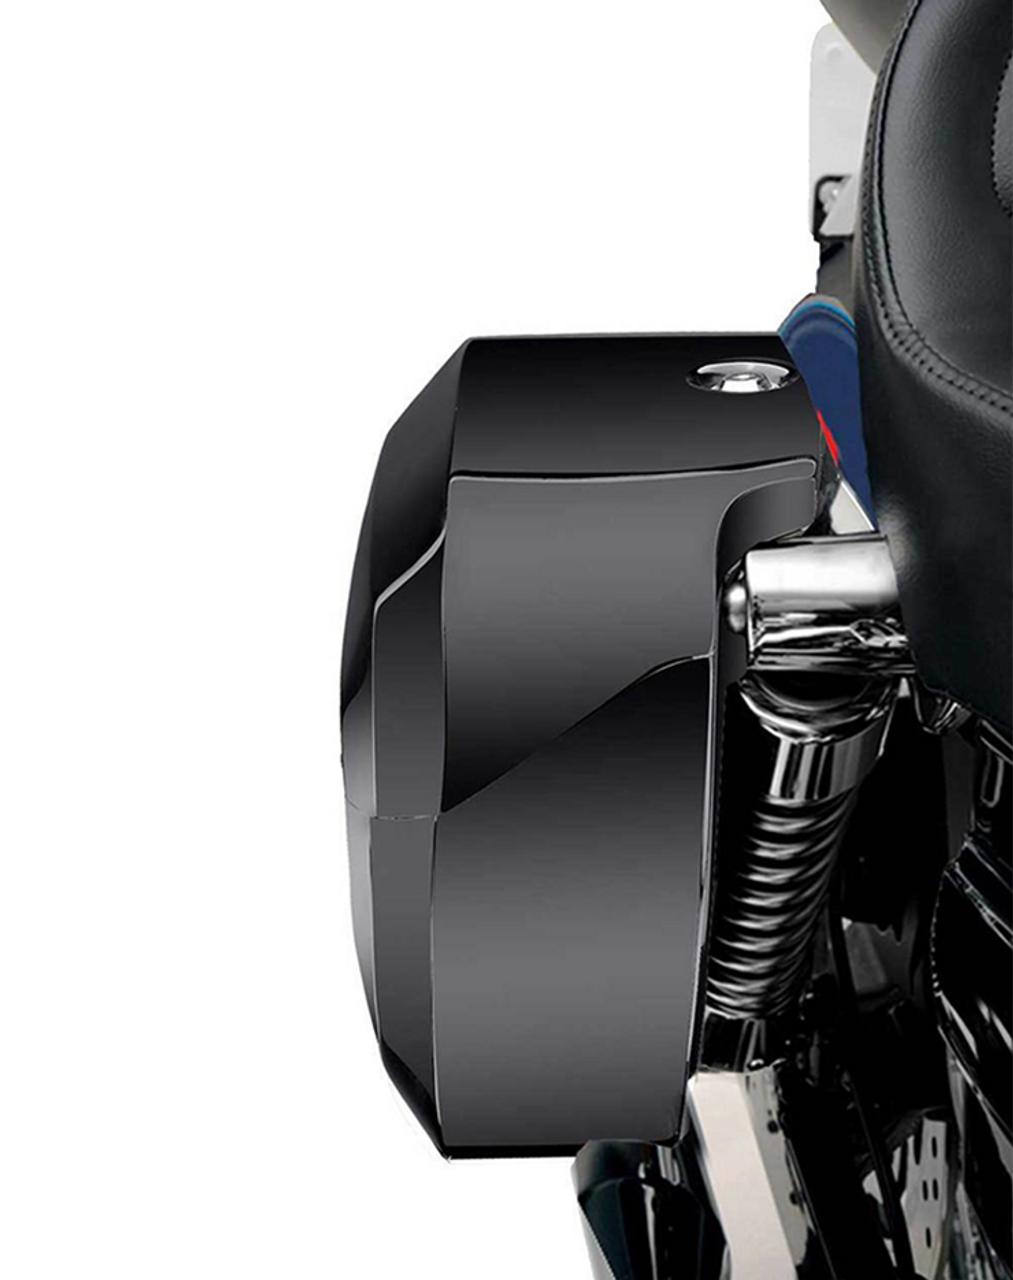 Honda VTX 1800 F Viking Lamellar Painted Extra Large Shock Cutout Saddlebags Shock Cutout View